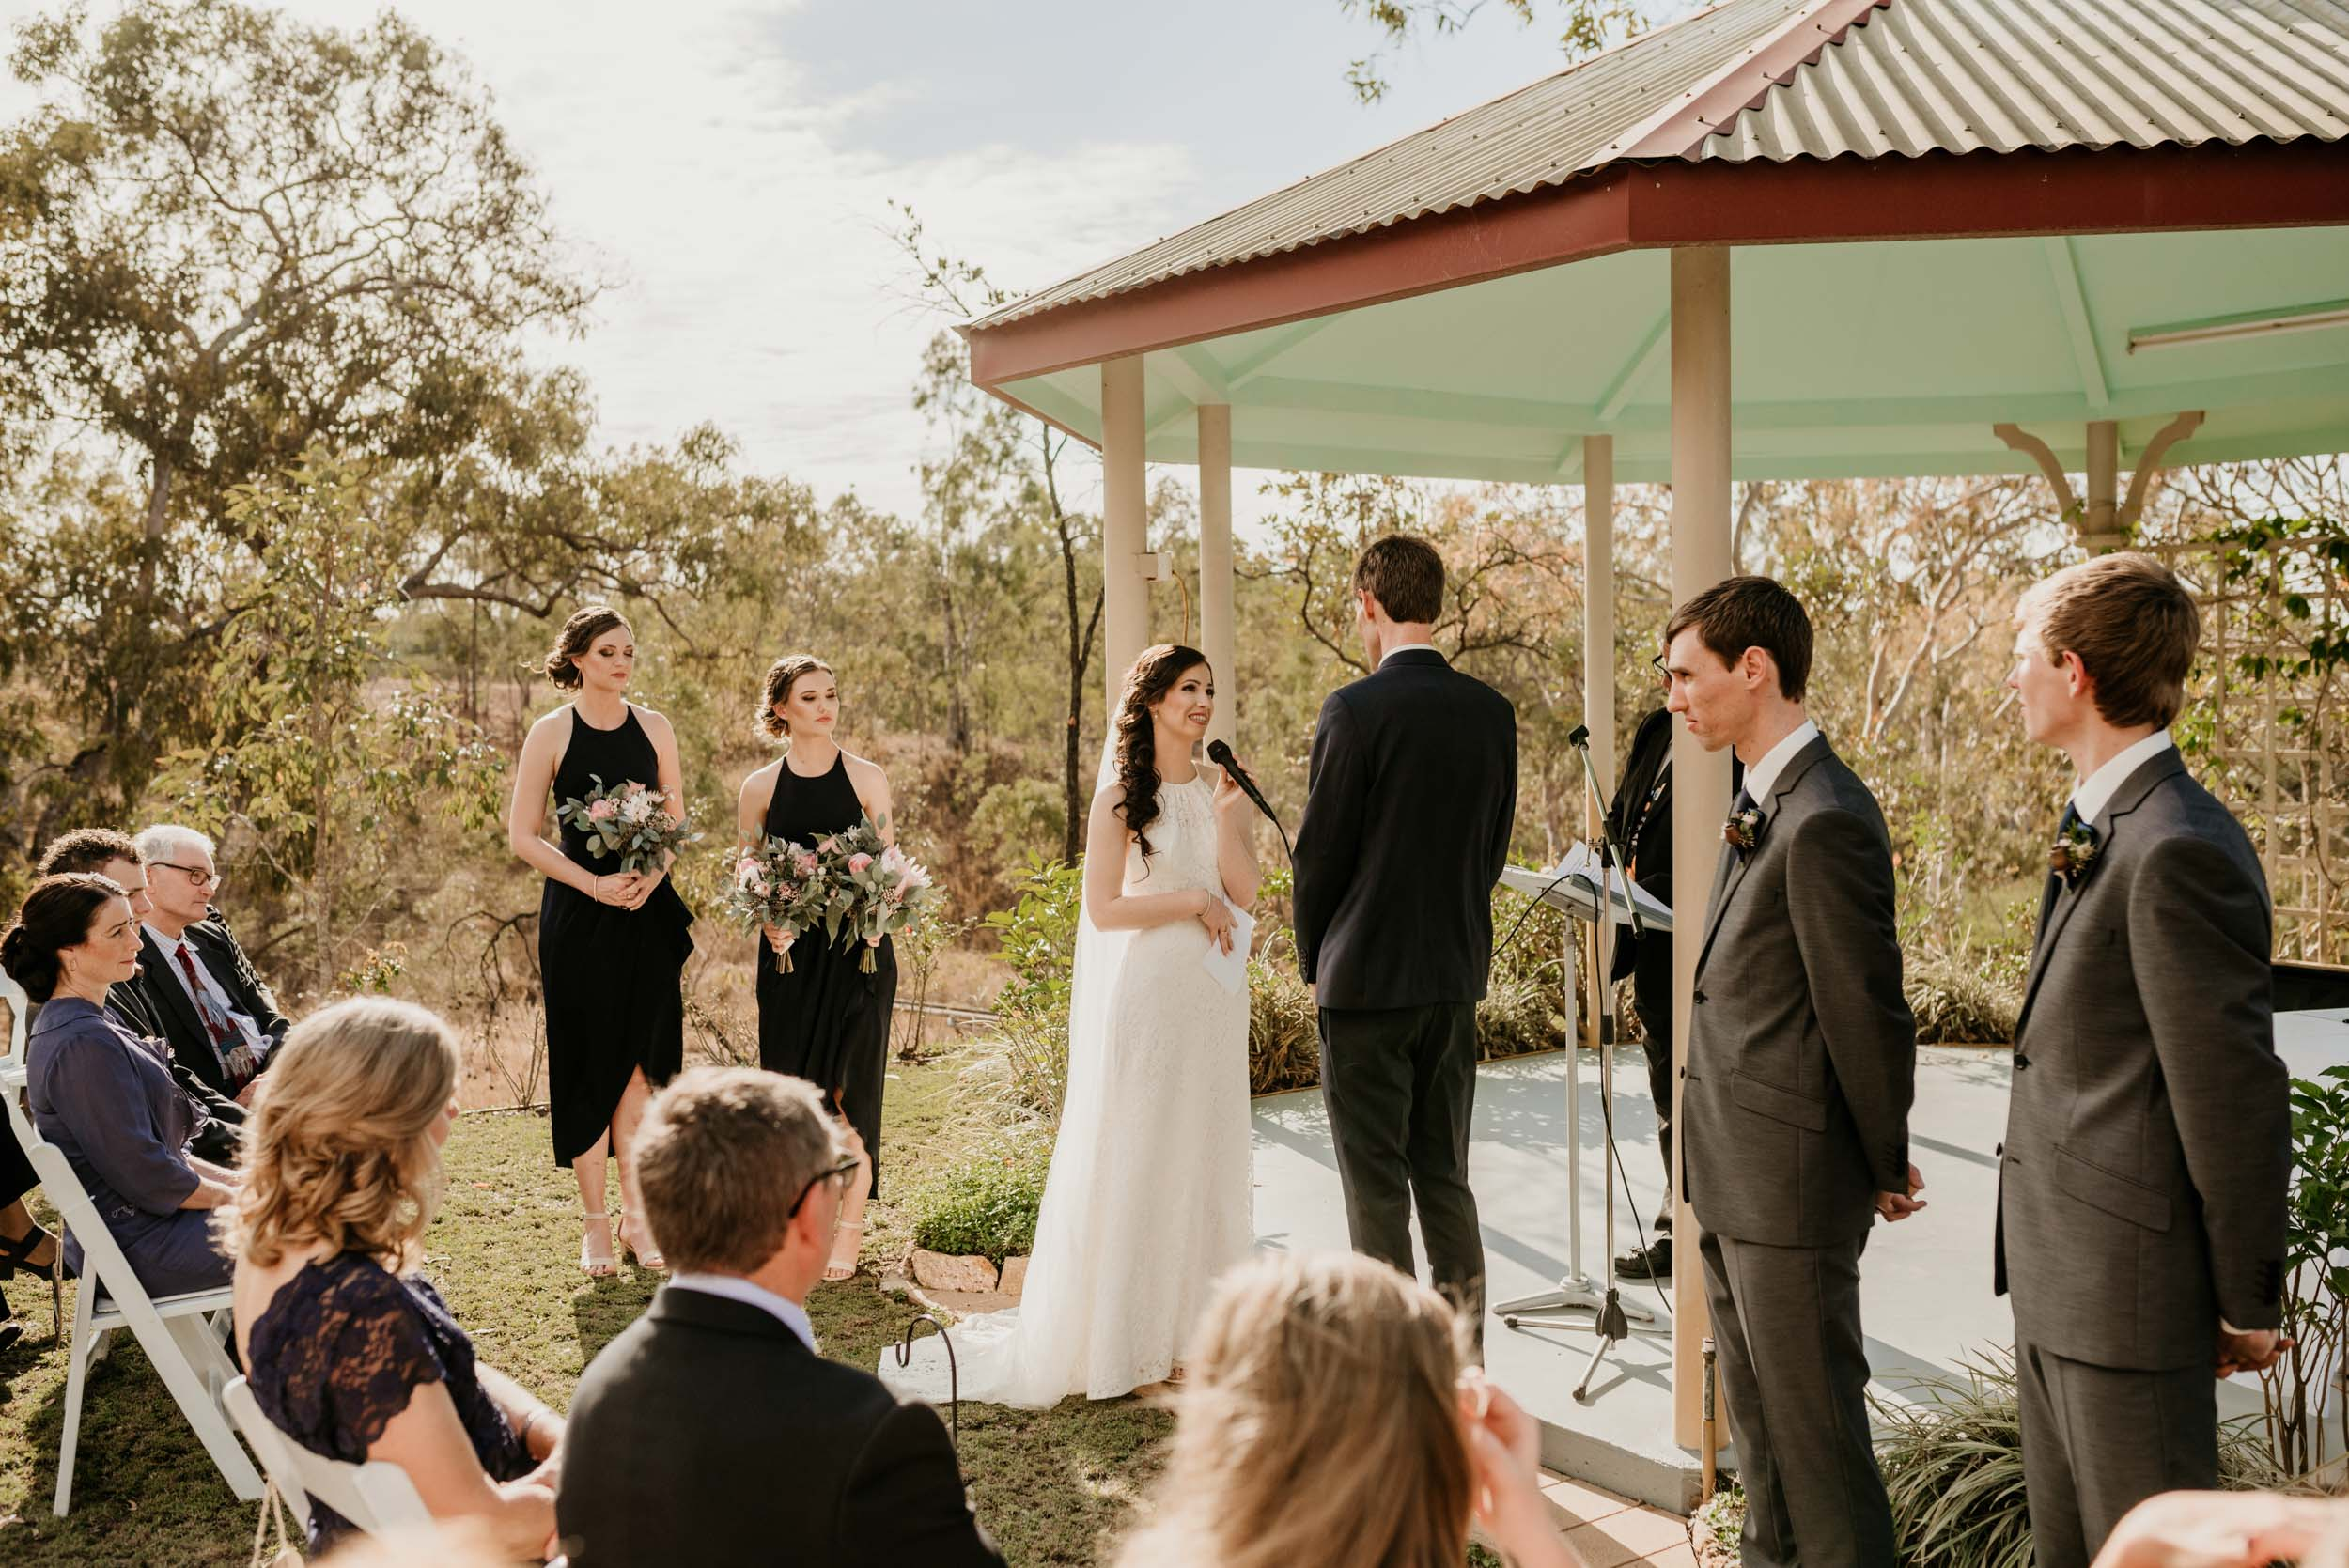 The Raw Photographer - Cairns Wedding Photographer - Atherton Tablelands Venue - Mareeba Photography-32.jpg